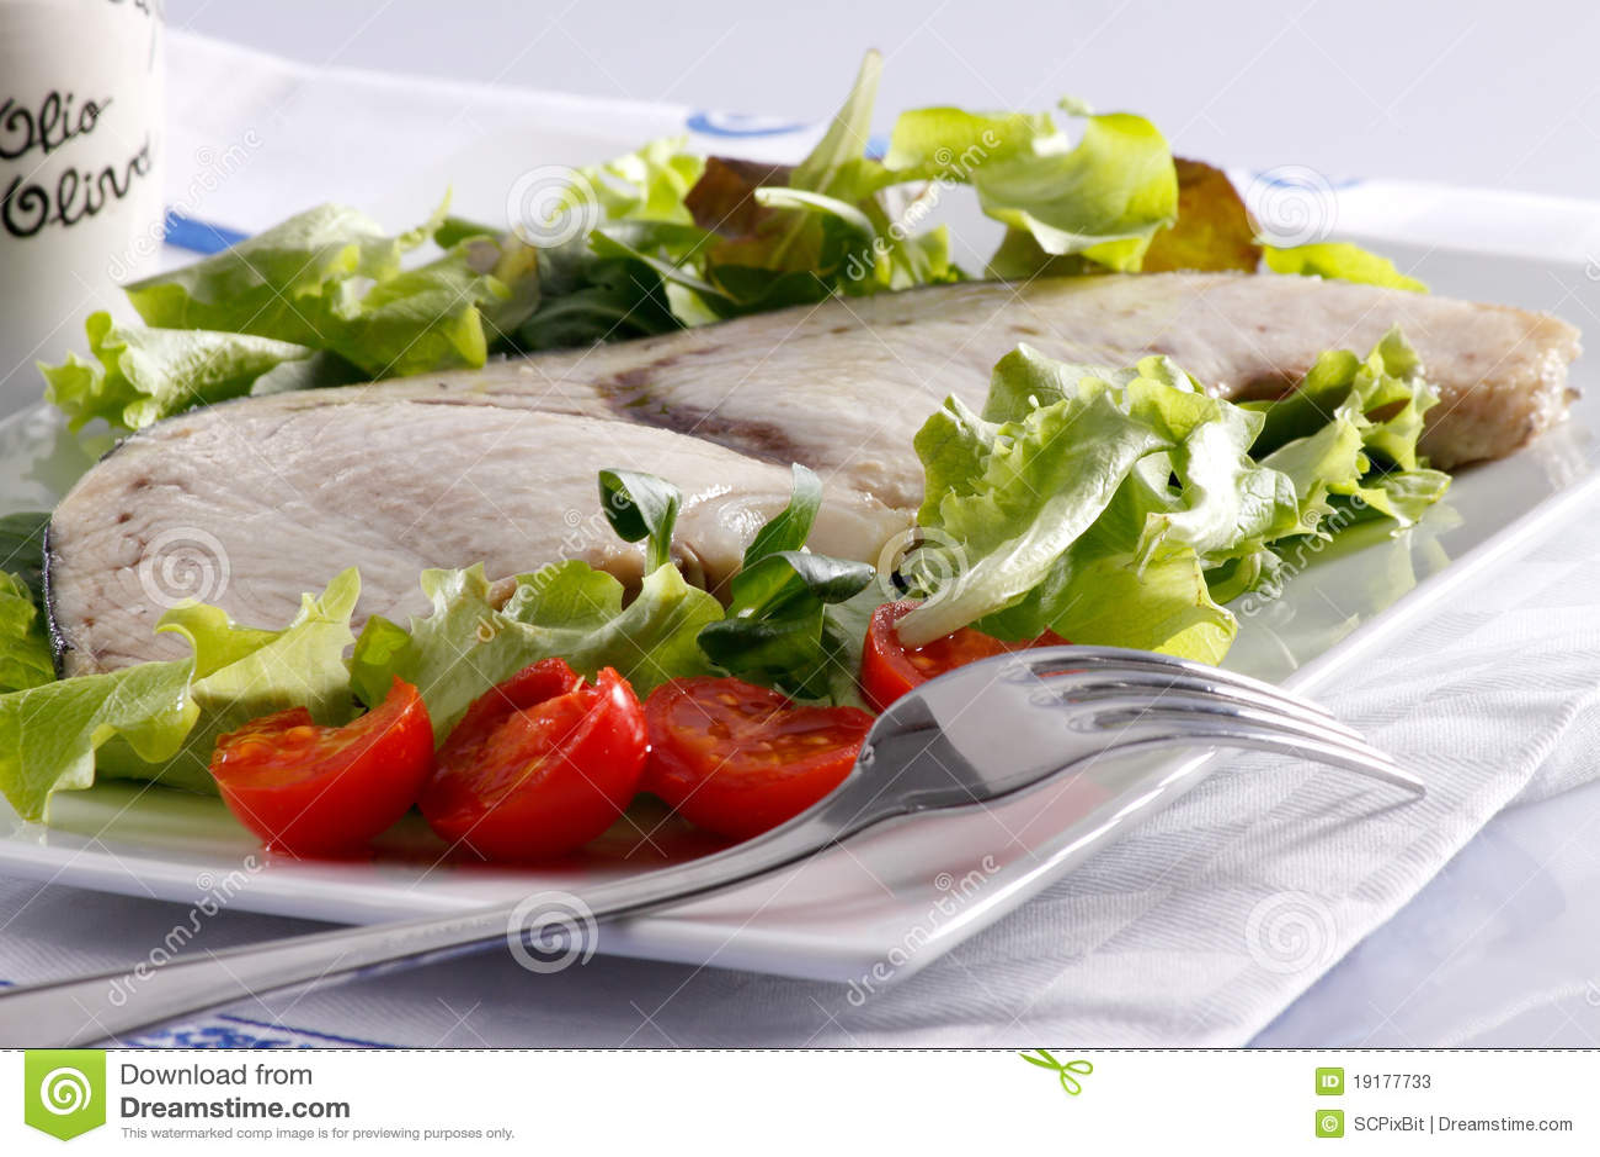 Pesce spada - Swordfish